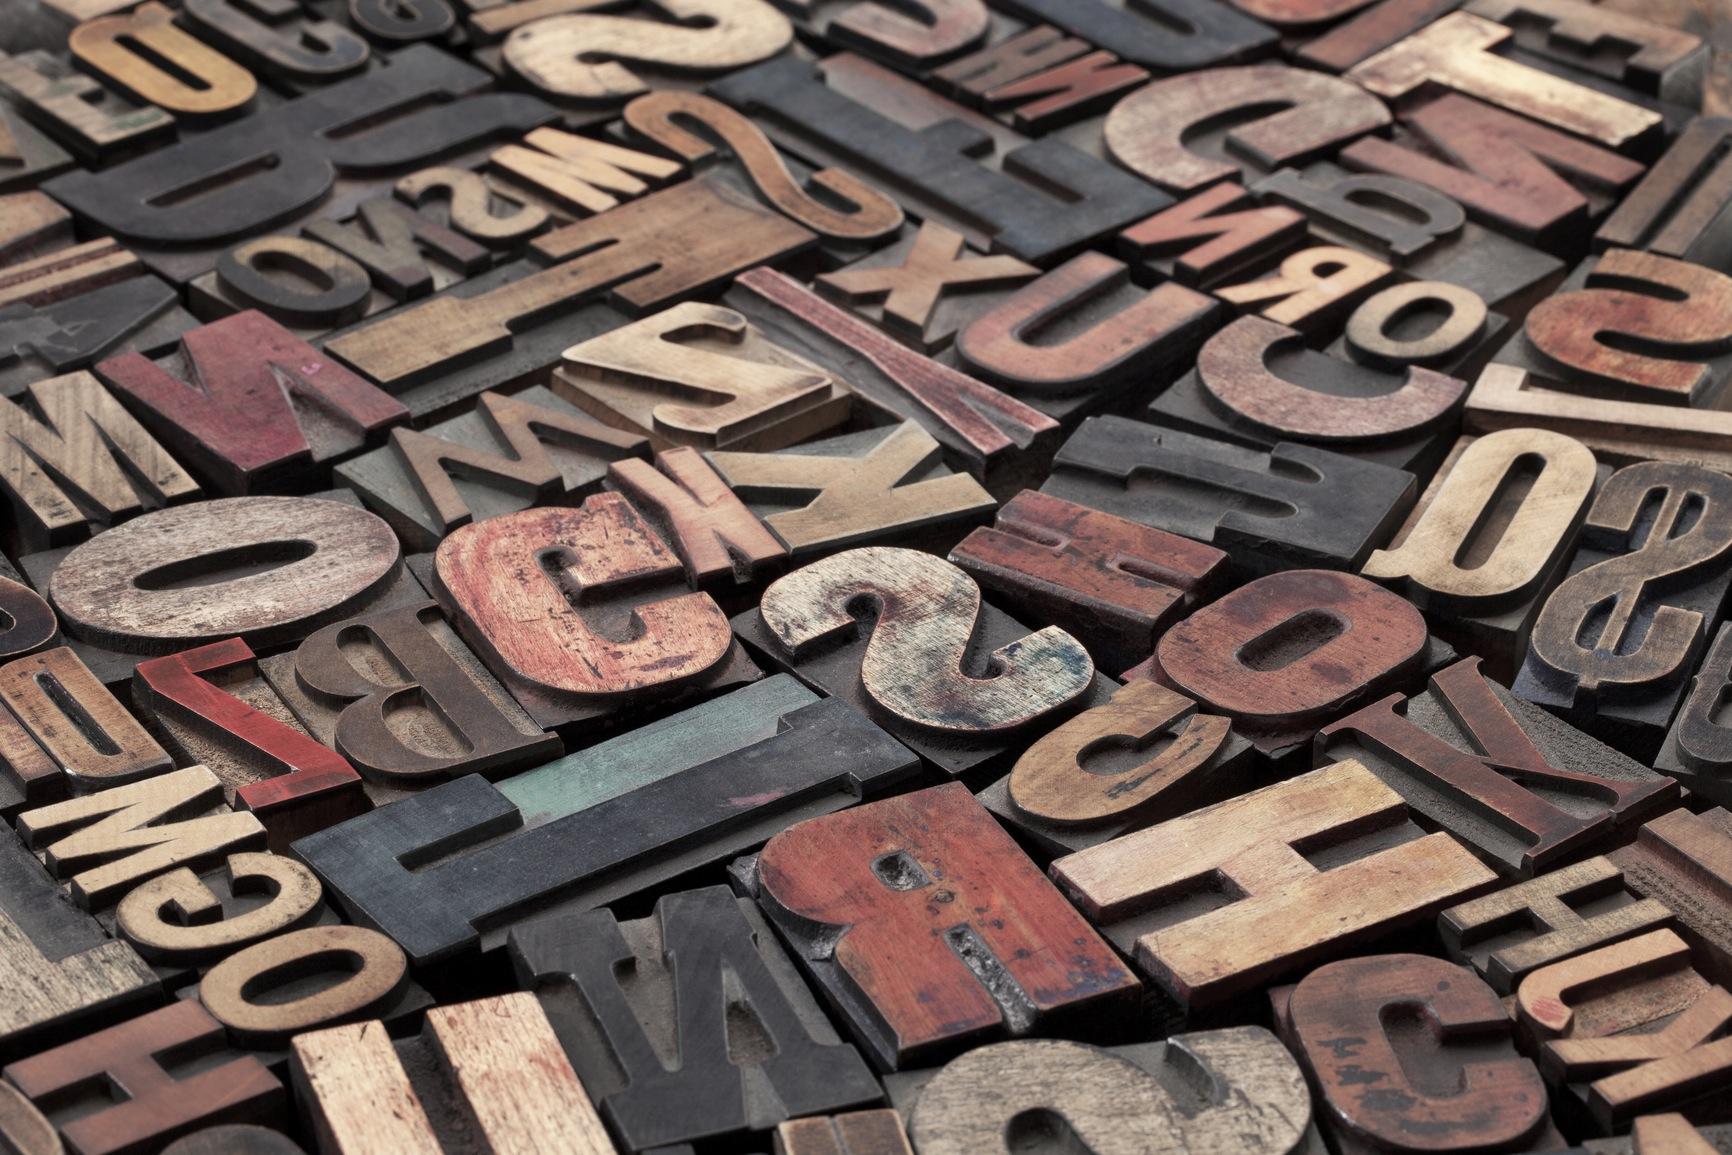 stockfresh_1180468_antique-letterpress-printing-blocks_sizeM_5256f2.jpg